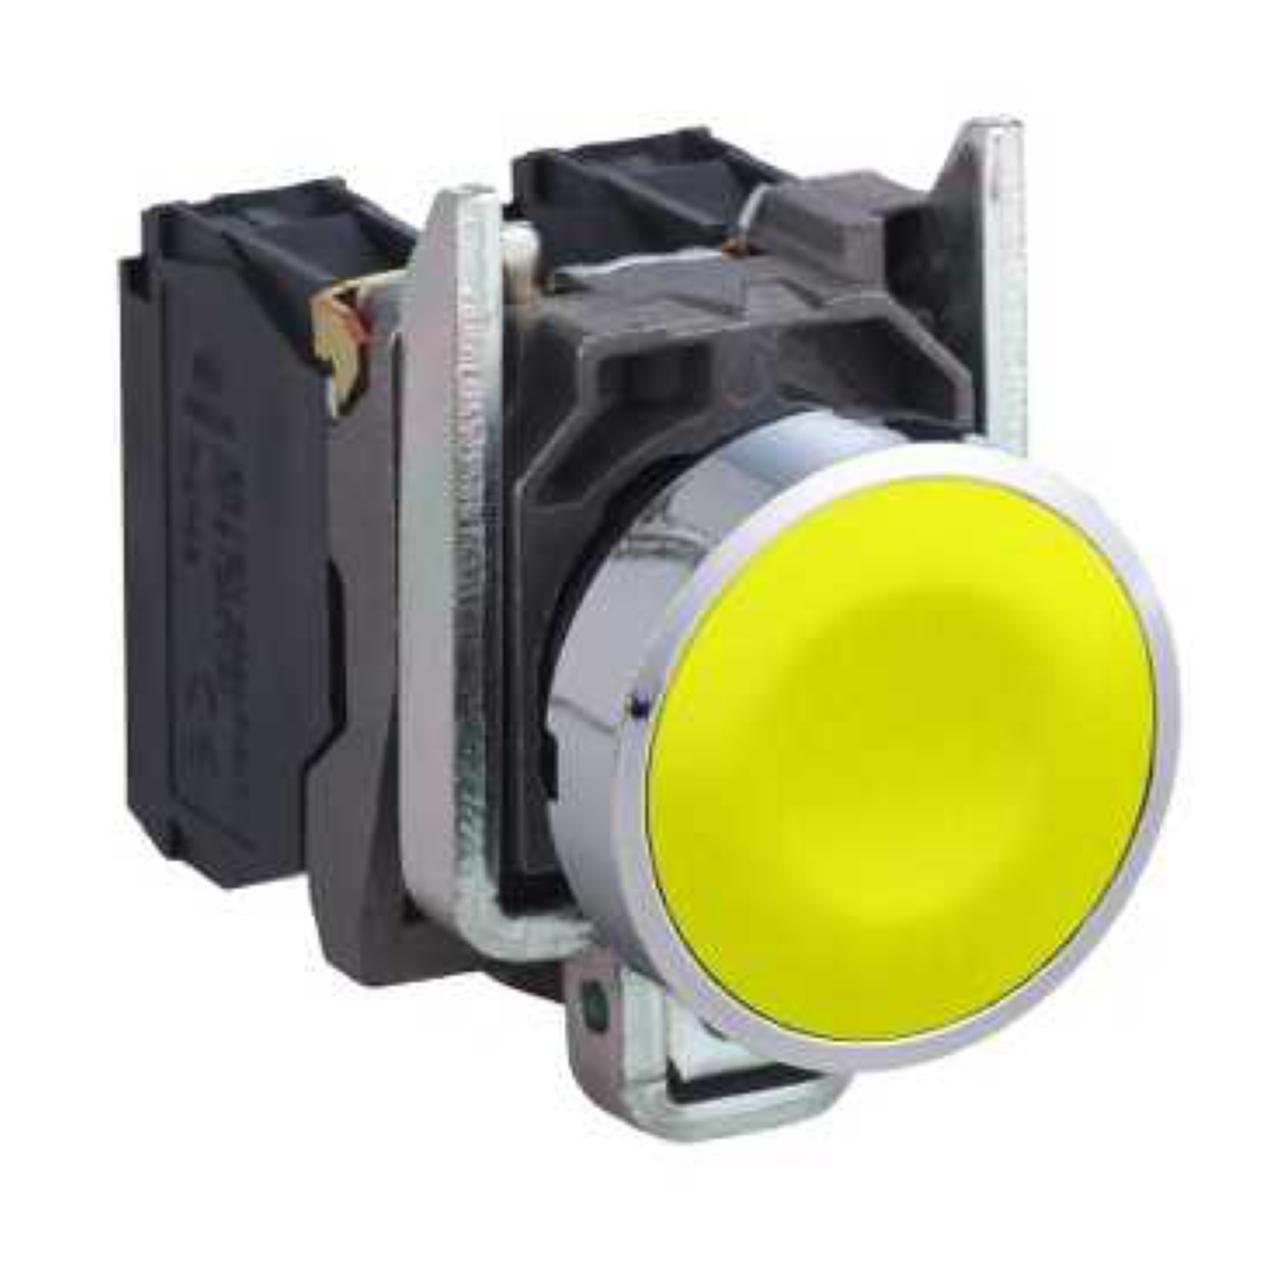 bouton poussoir affleurant 1 no jaune complet schn. Black Bedroom Furniture Sets. Home Design Ideas